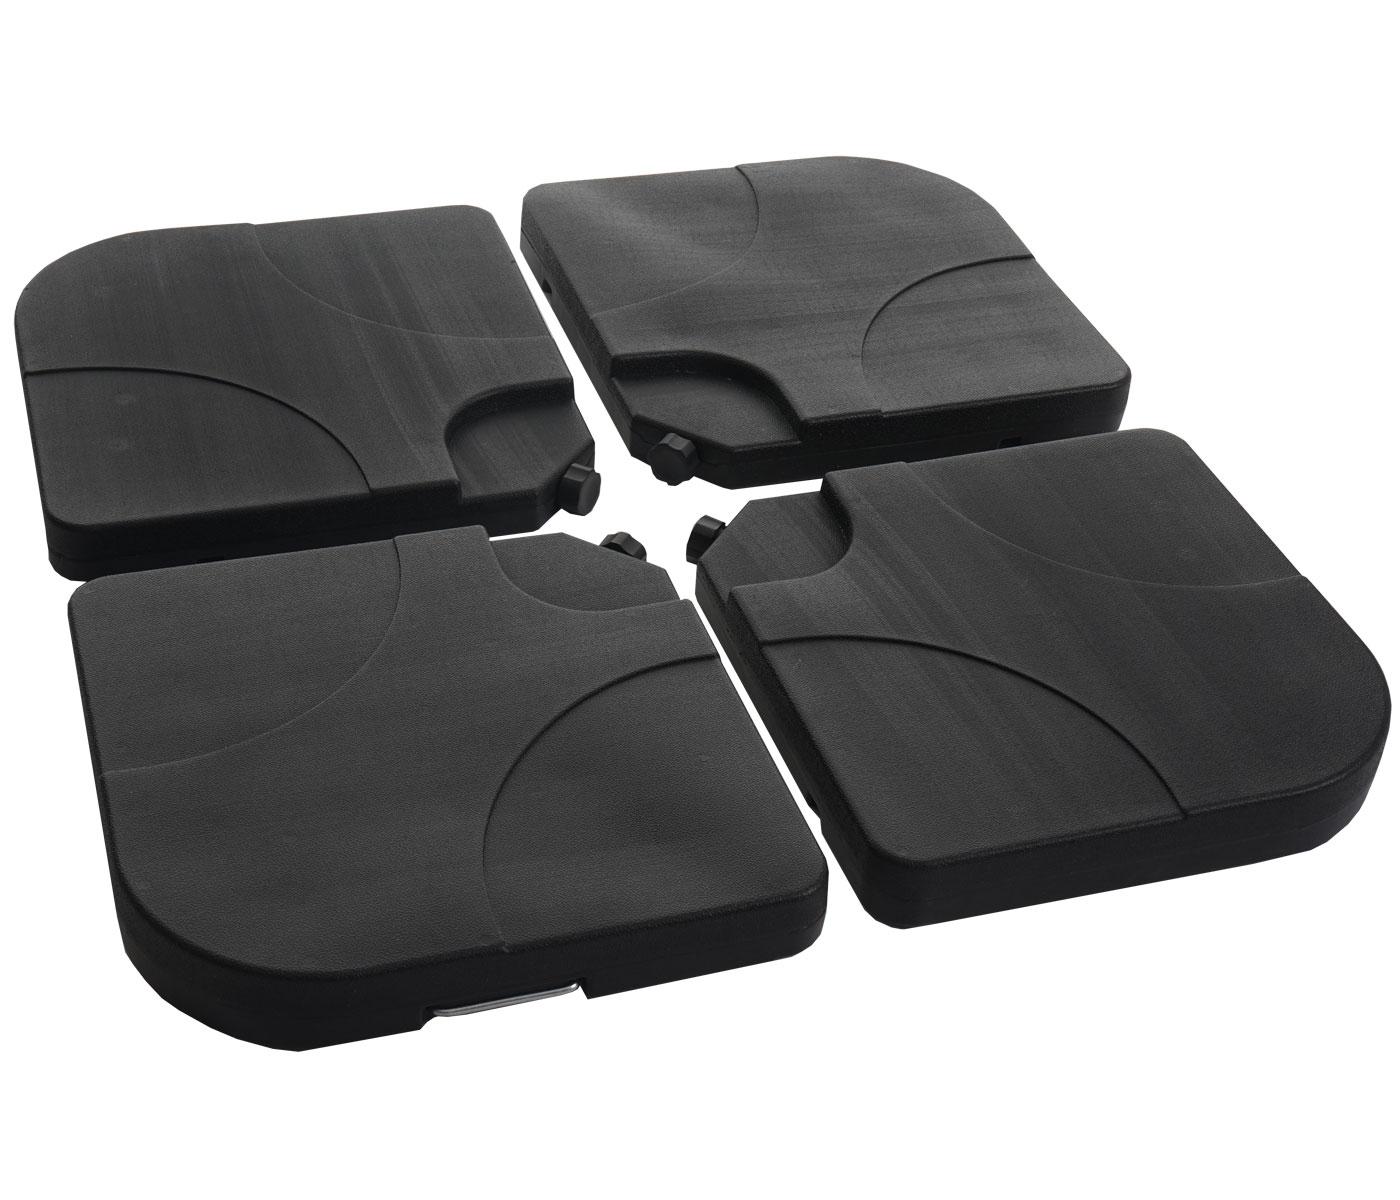 semi profi ampelschirm acerra sonnenschutz 3m neigbar gr n lemon mit st nder. Black Bedroom Furniture Sets. Home Design Ideas